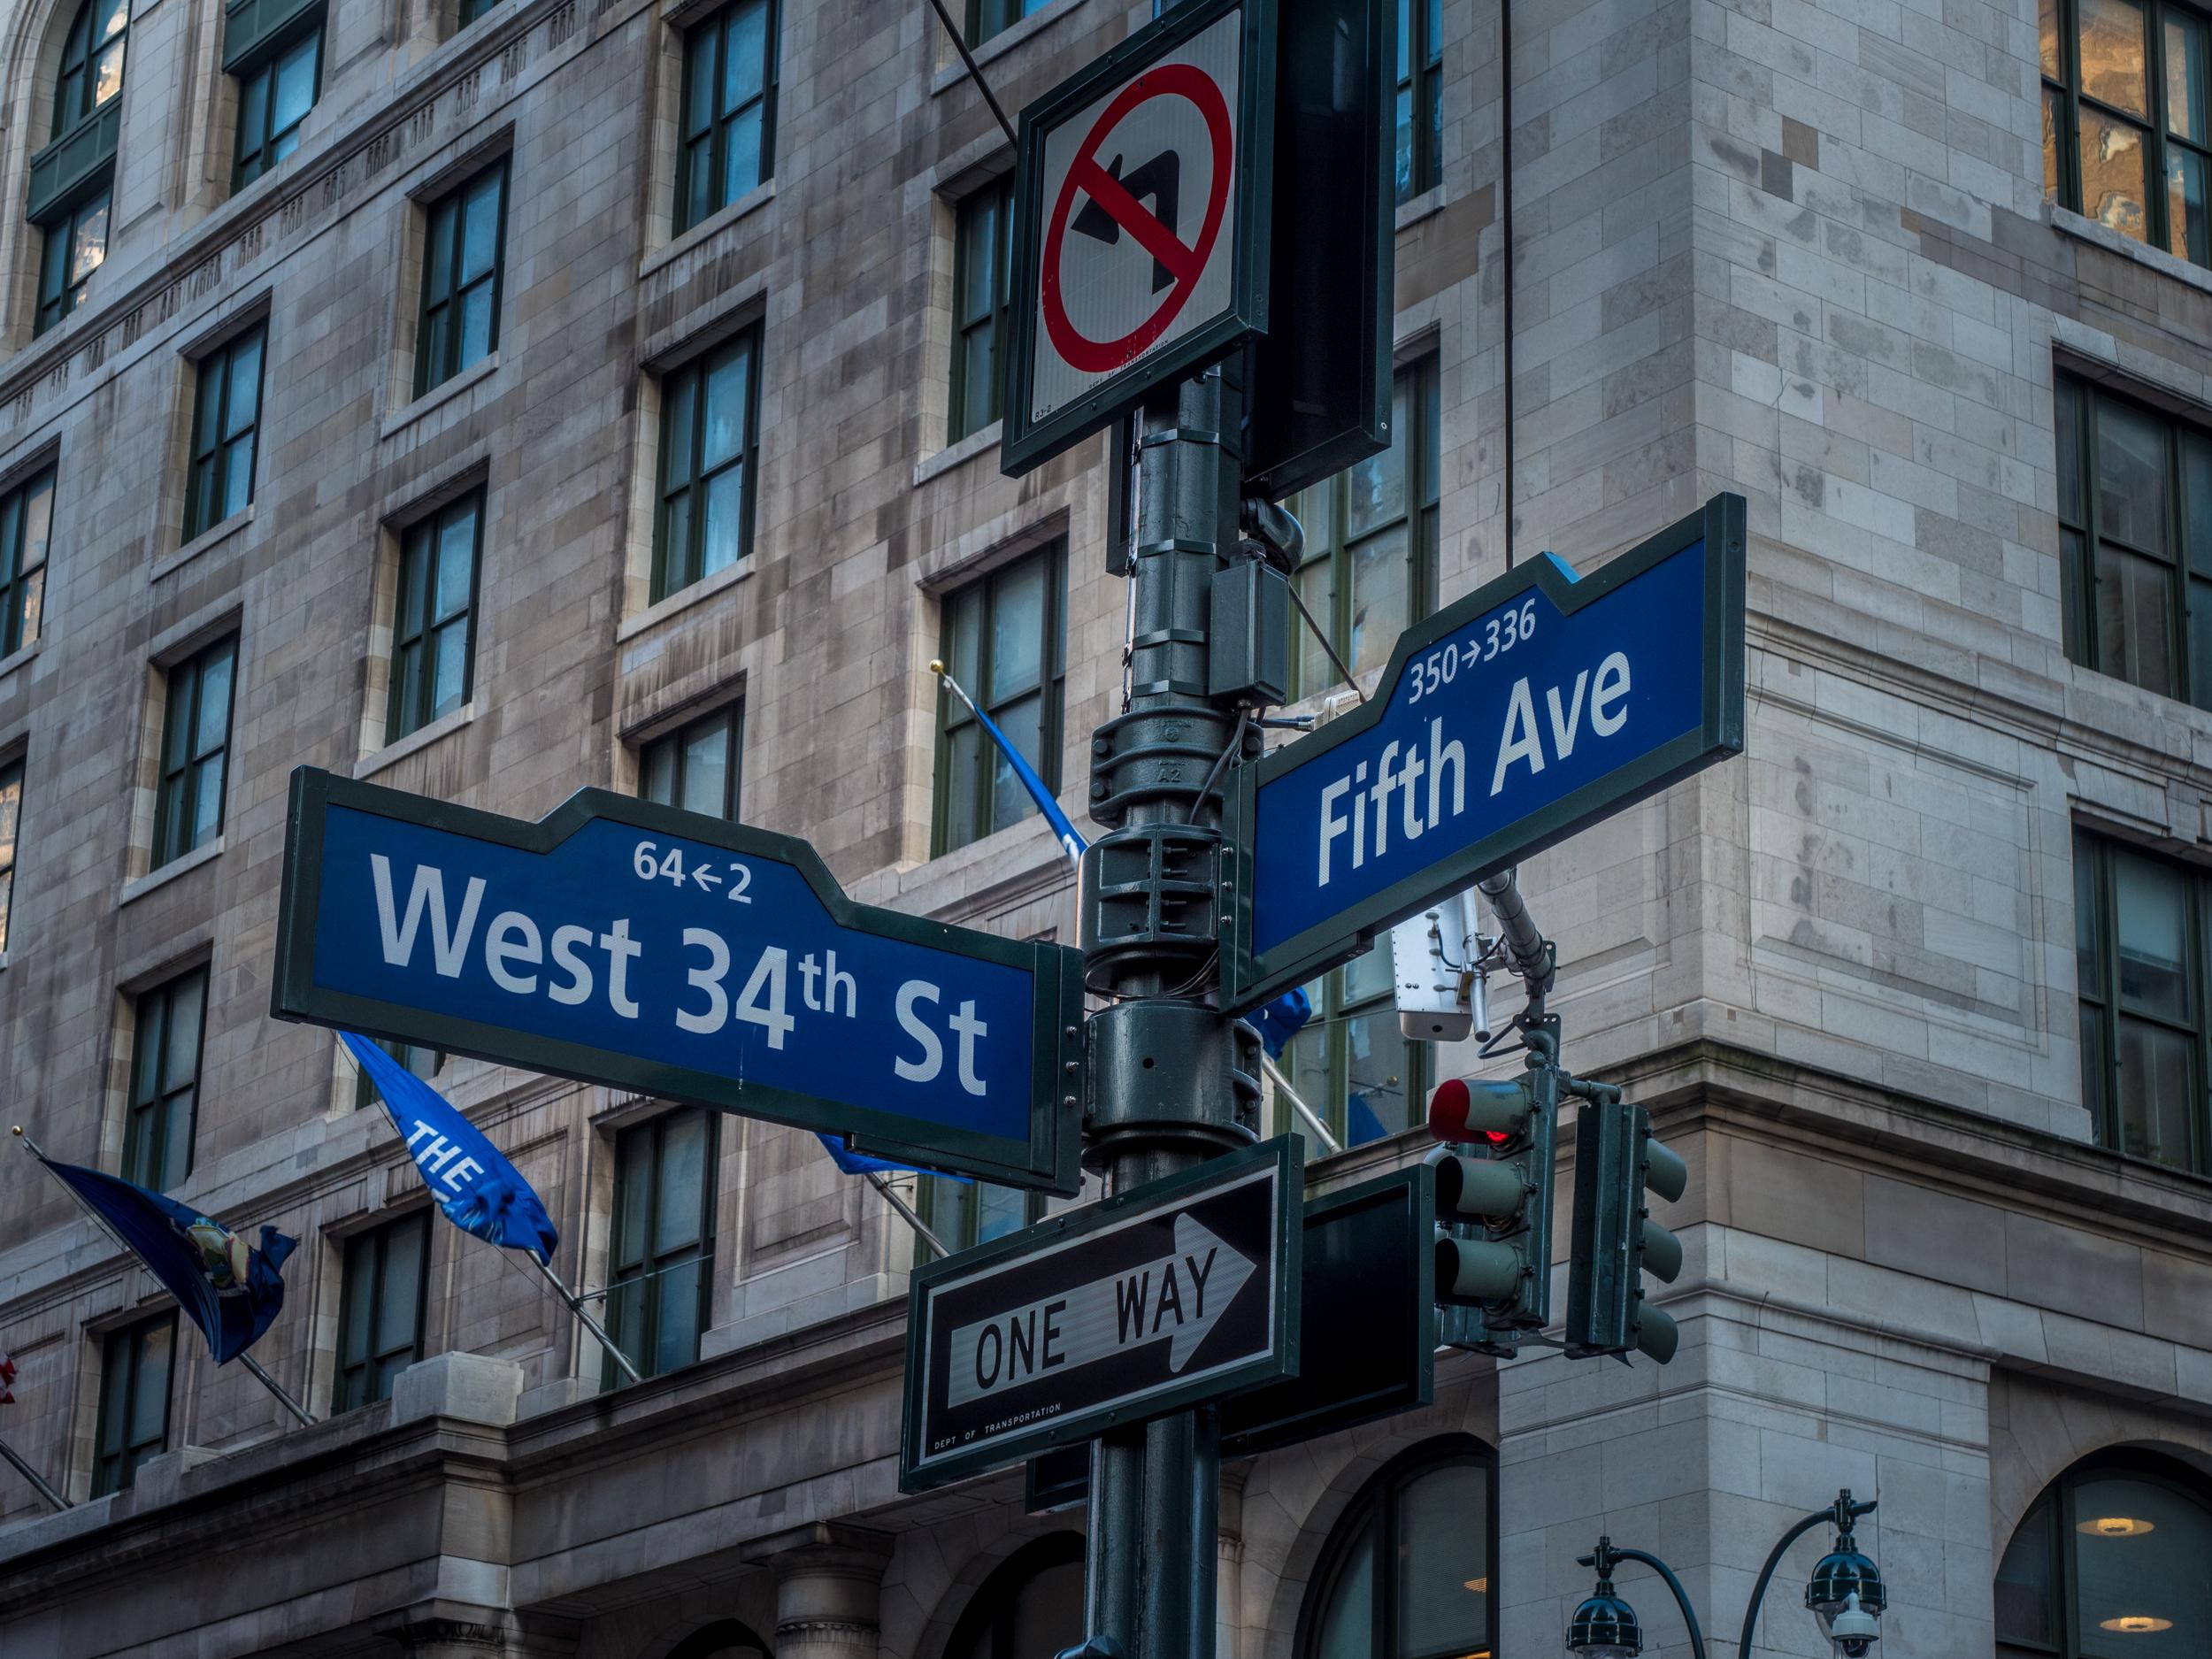 34th street.jpg